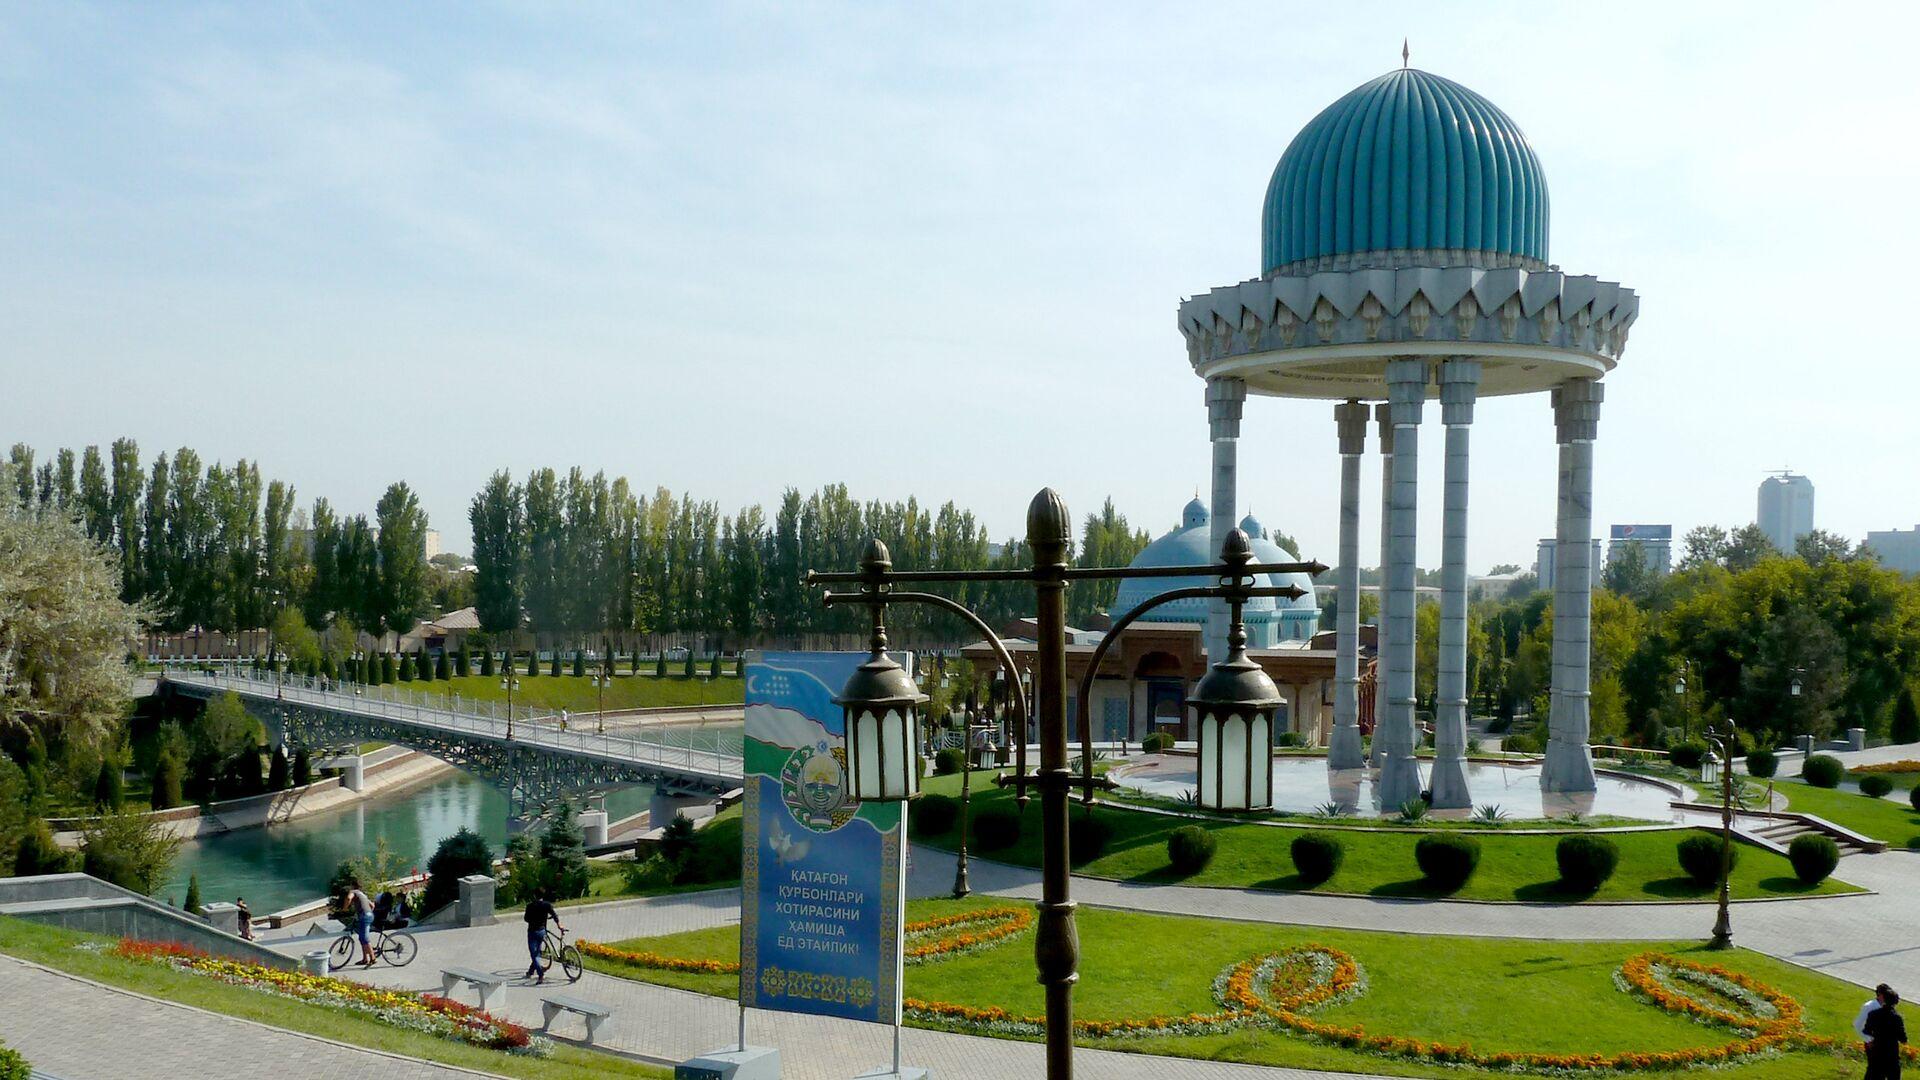 Монумент жертвам репрессий в комплексе Шахидлар хотираси  - Sputnik Узбекистан, 1920, 16.04.2021